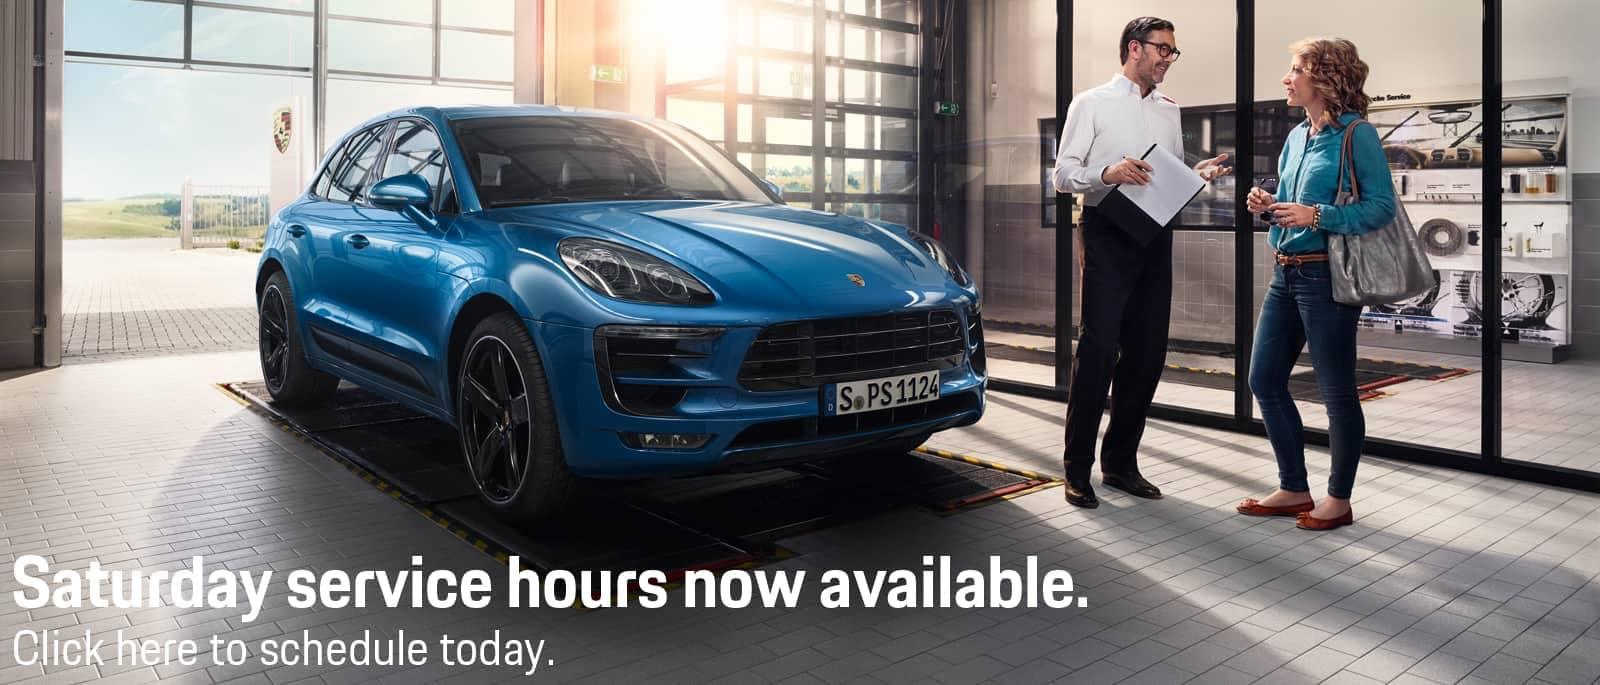 Porsche-Saturday-Service